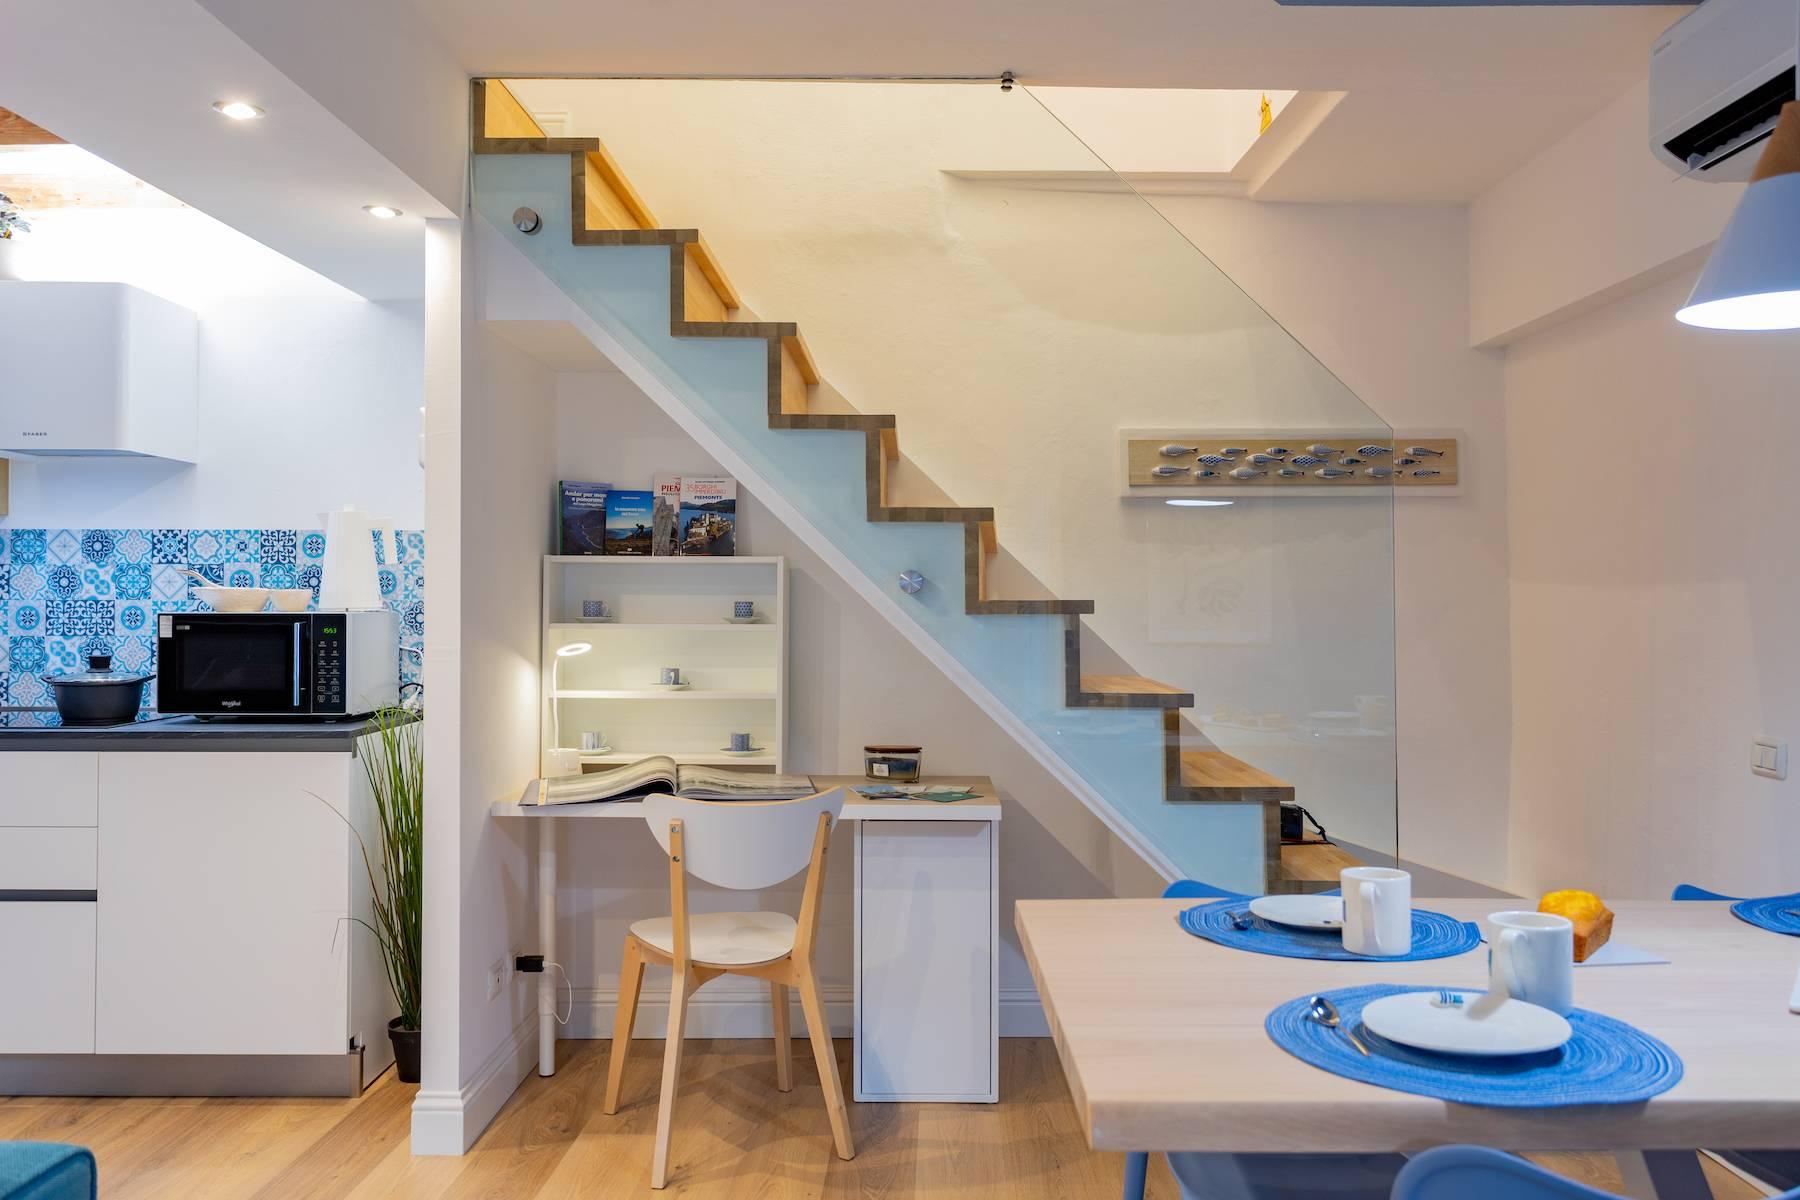 Appartamento in Vendita a Belgirate: 3 locali, 62 mq - Foto 9